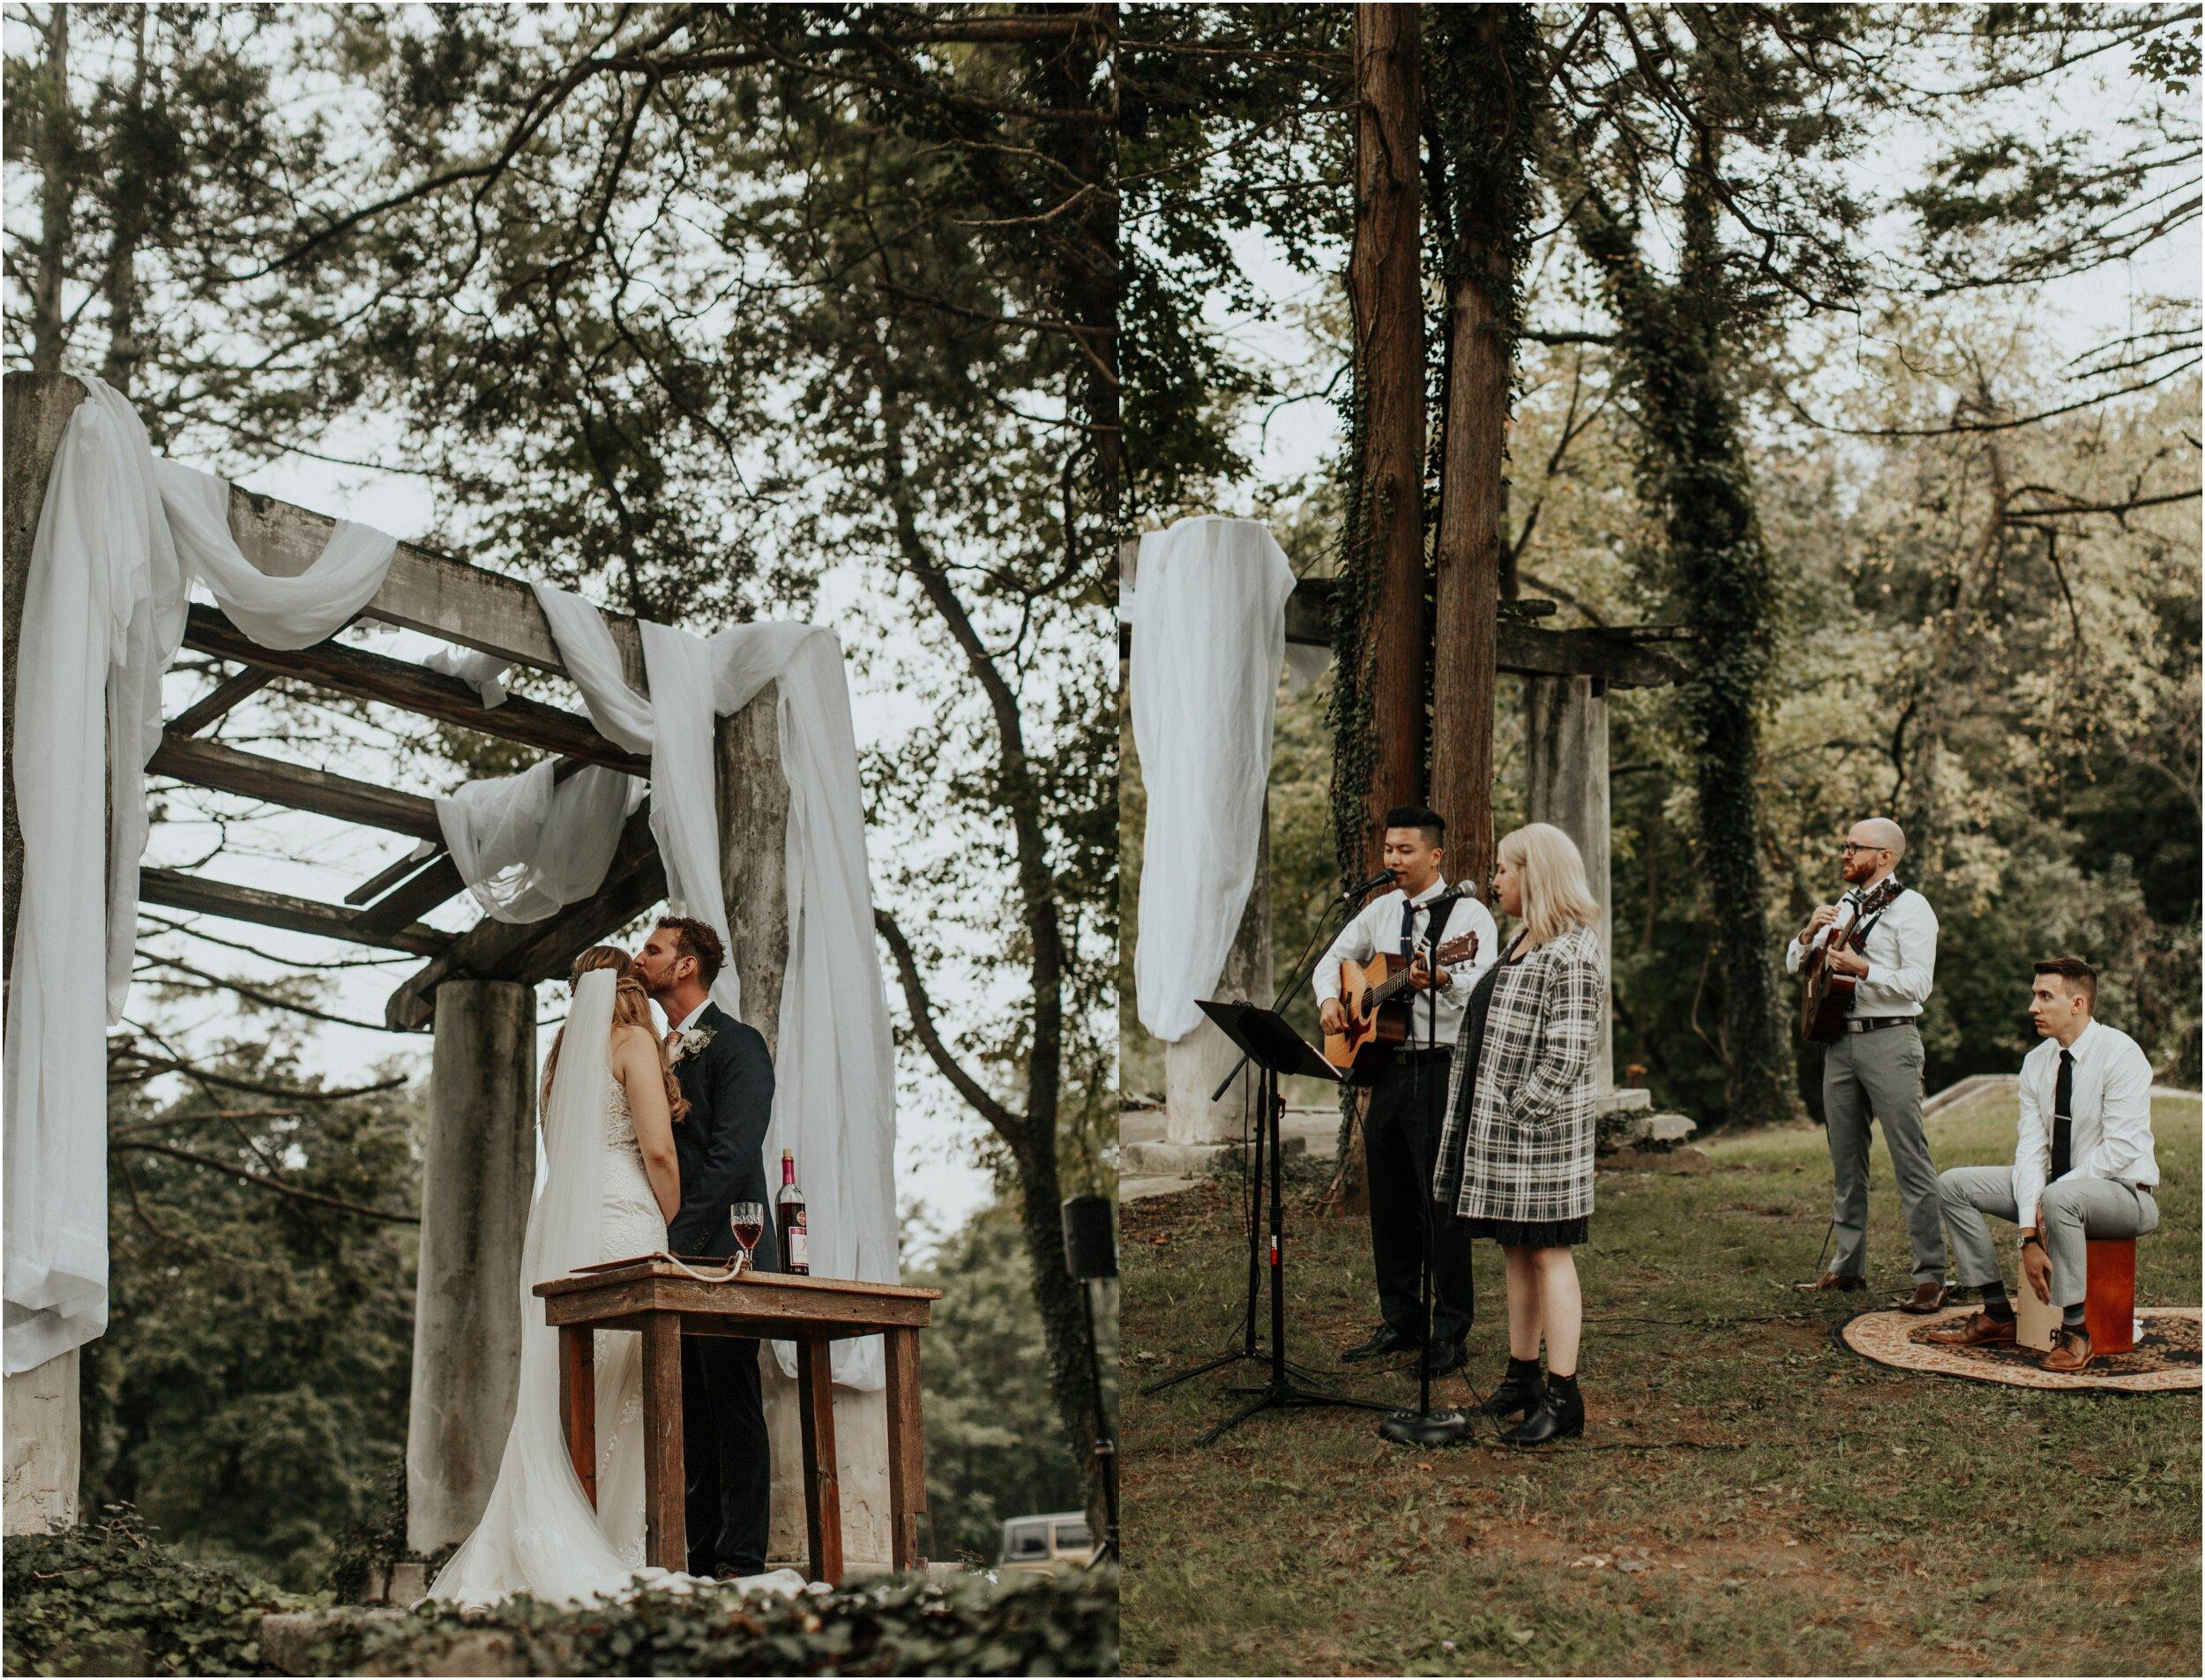 steph-and-jordan-cox-our-wedding-historic-shady-lane-compass-wedding-collective-hazel-lining-photography-destination-elopement-wedding-engagement-photography_0061.jpg